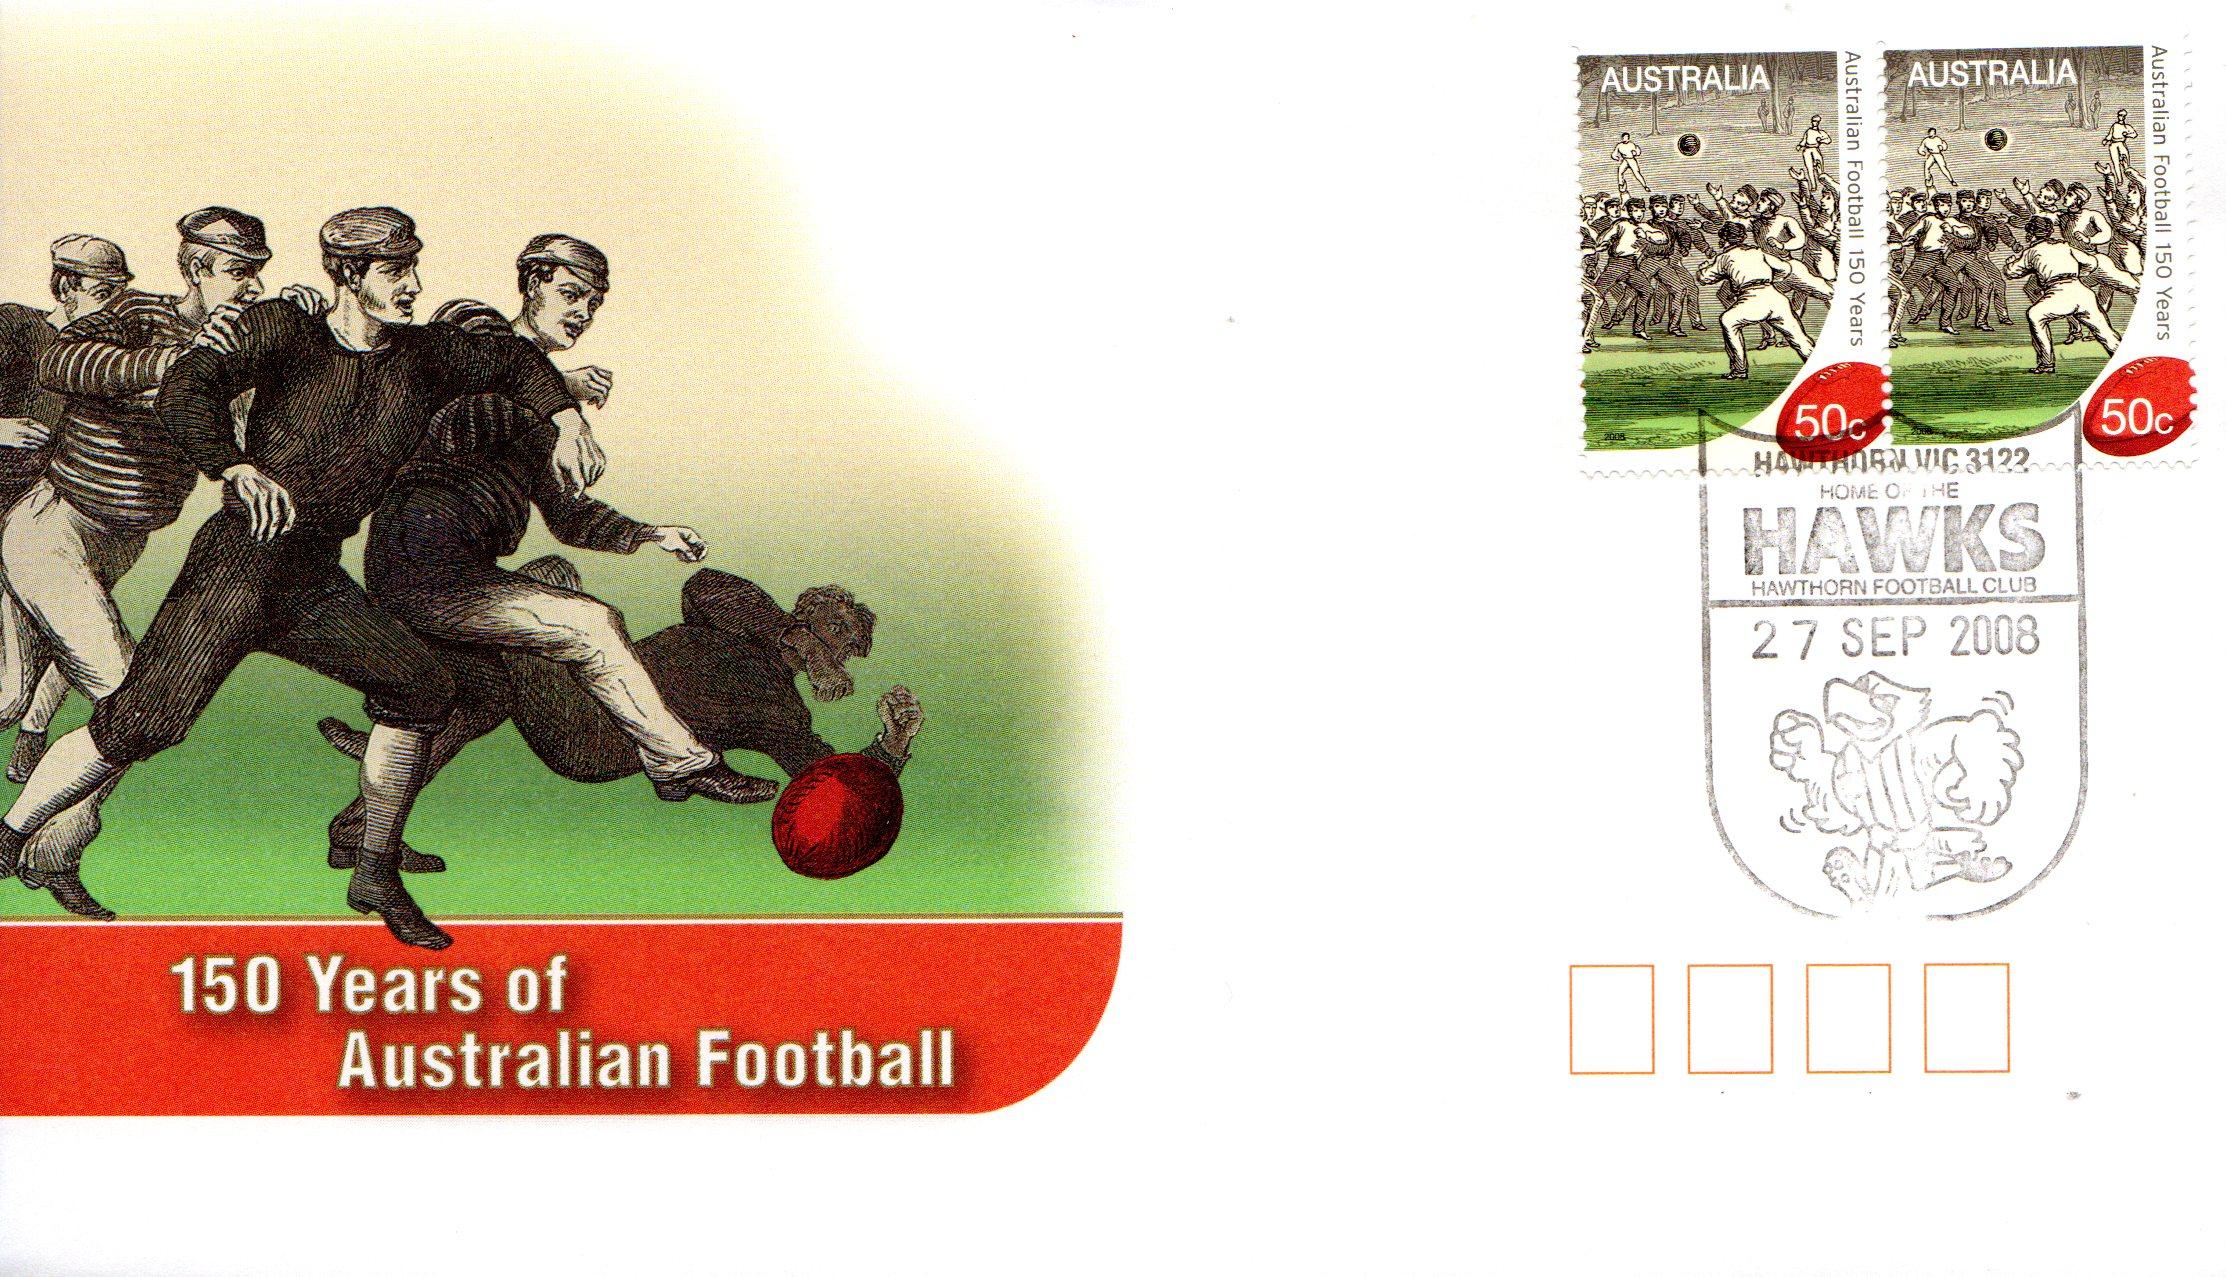 GF HH PM 150 Years of Australian Football